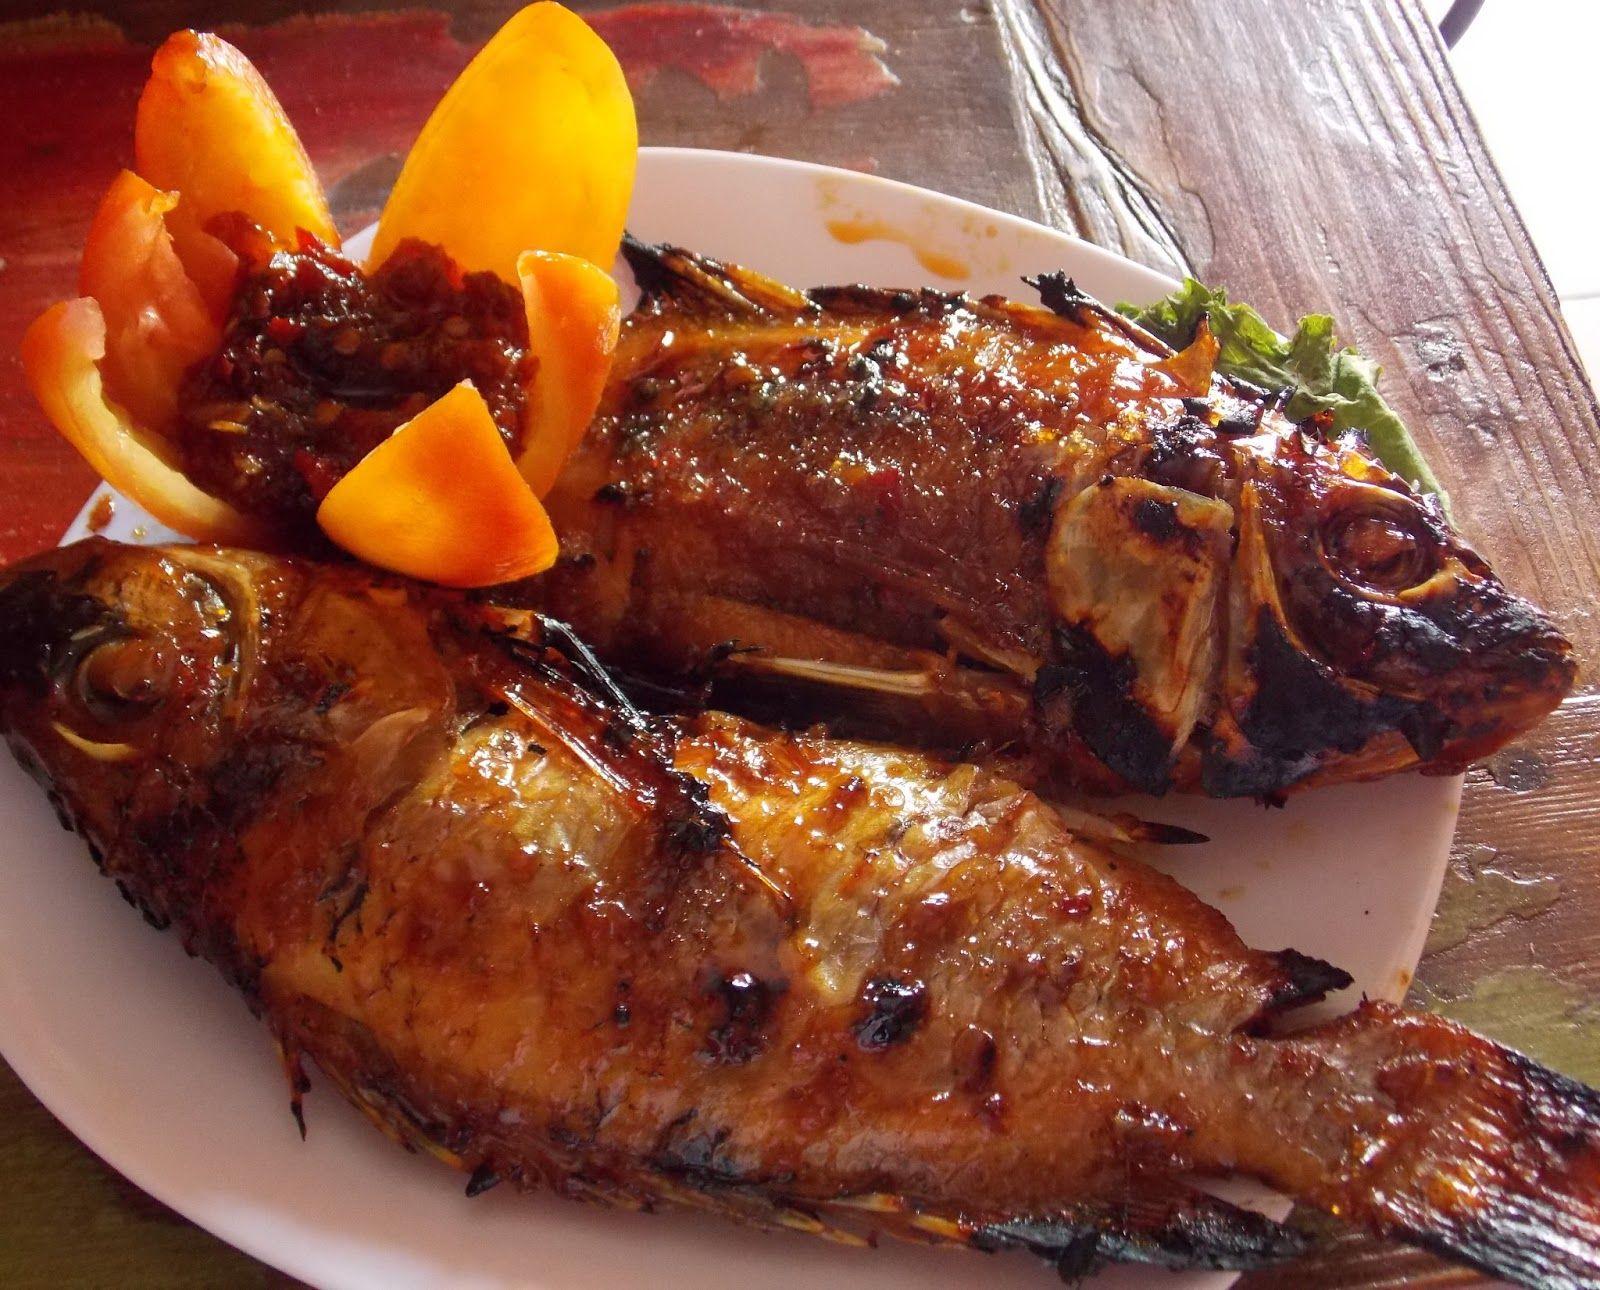 Resep Ikan Kakap Bakar Kecap Manis Enak Spesial Resep Ikan Kakap Bakar Kecap Manis Enak Spesial Ikan Laut Khususnya Ika Resep Ikan Resep Ikan Bakar Saus Ikan